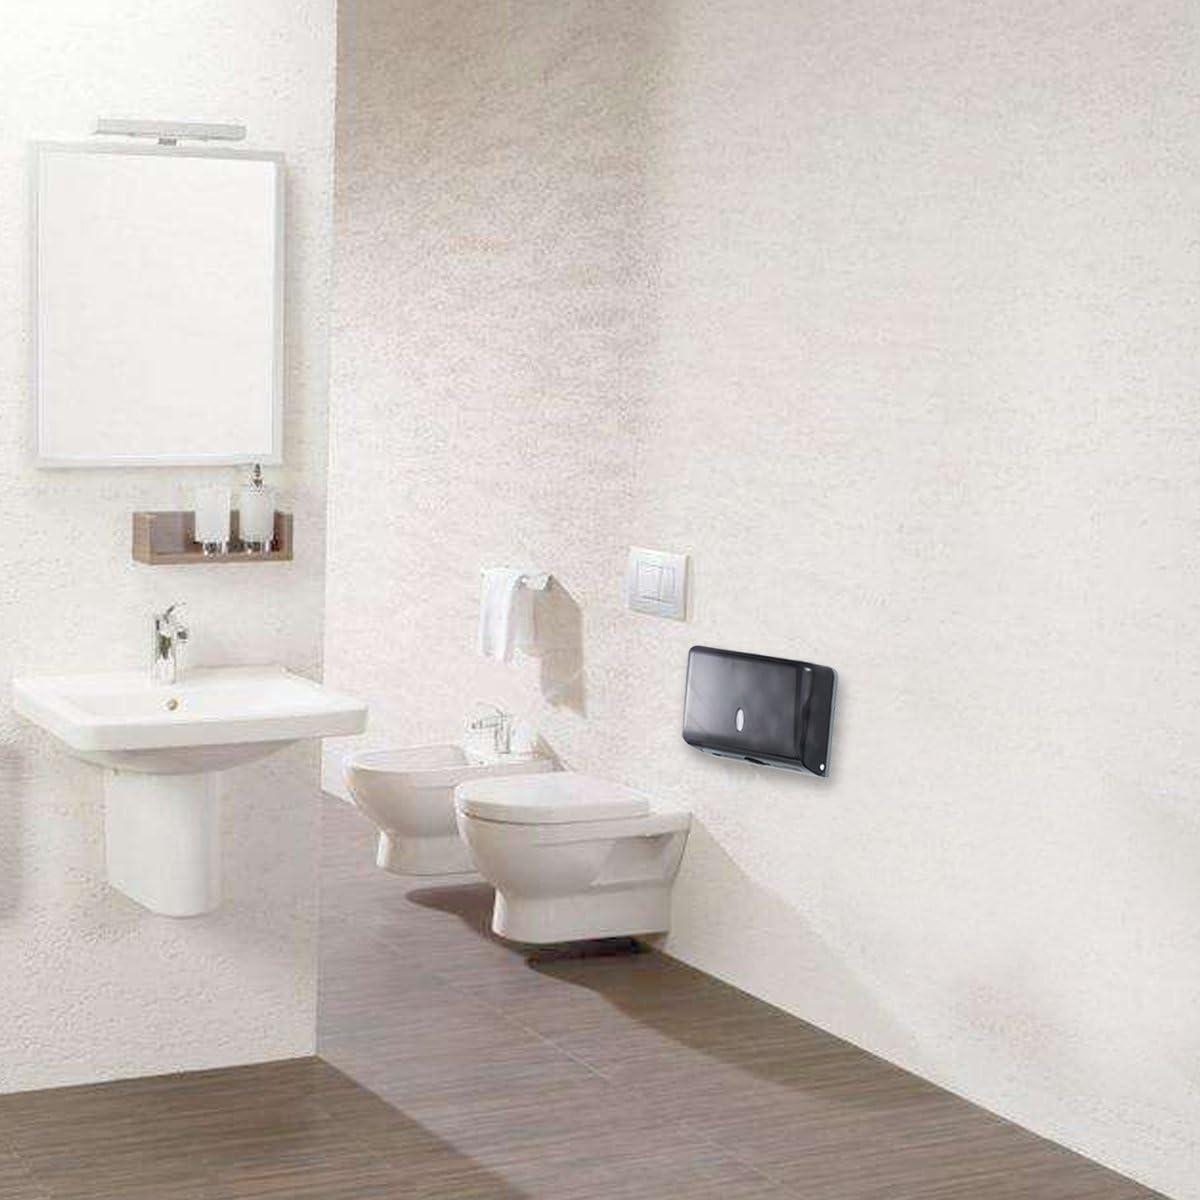 contenedor de papel dispensador de toallas de papel gris Portarrollos de papel de seda de pared para ba/ño OUNONA